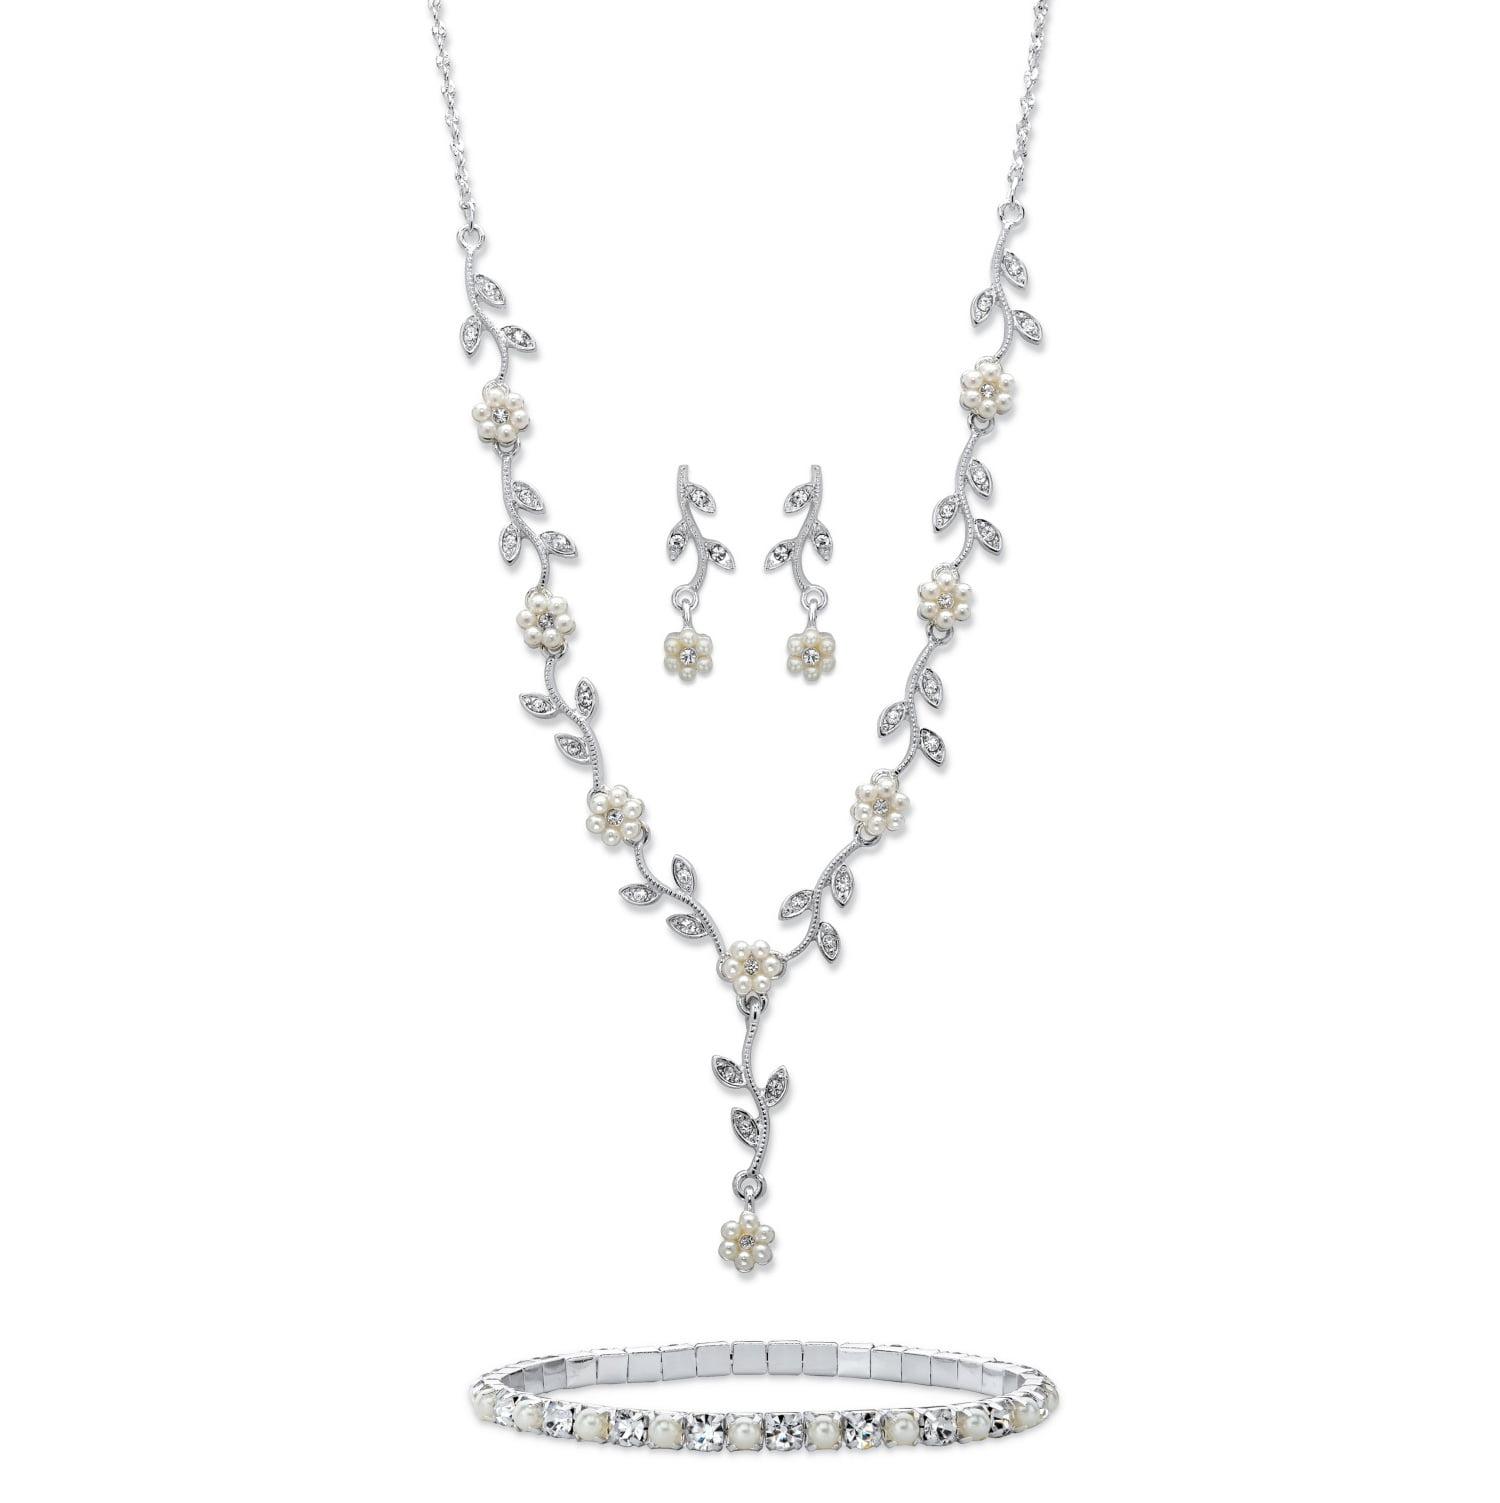 17+3 Simulated Cream Pearl 3-Row Silver Tone Necklace